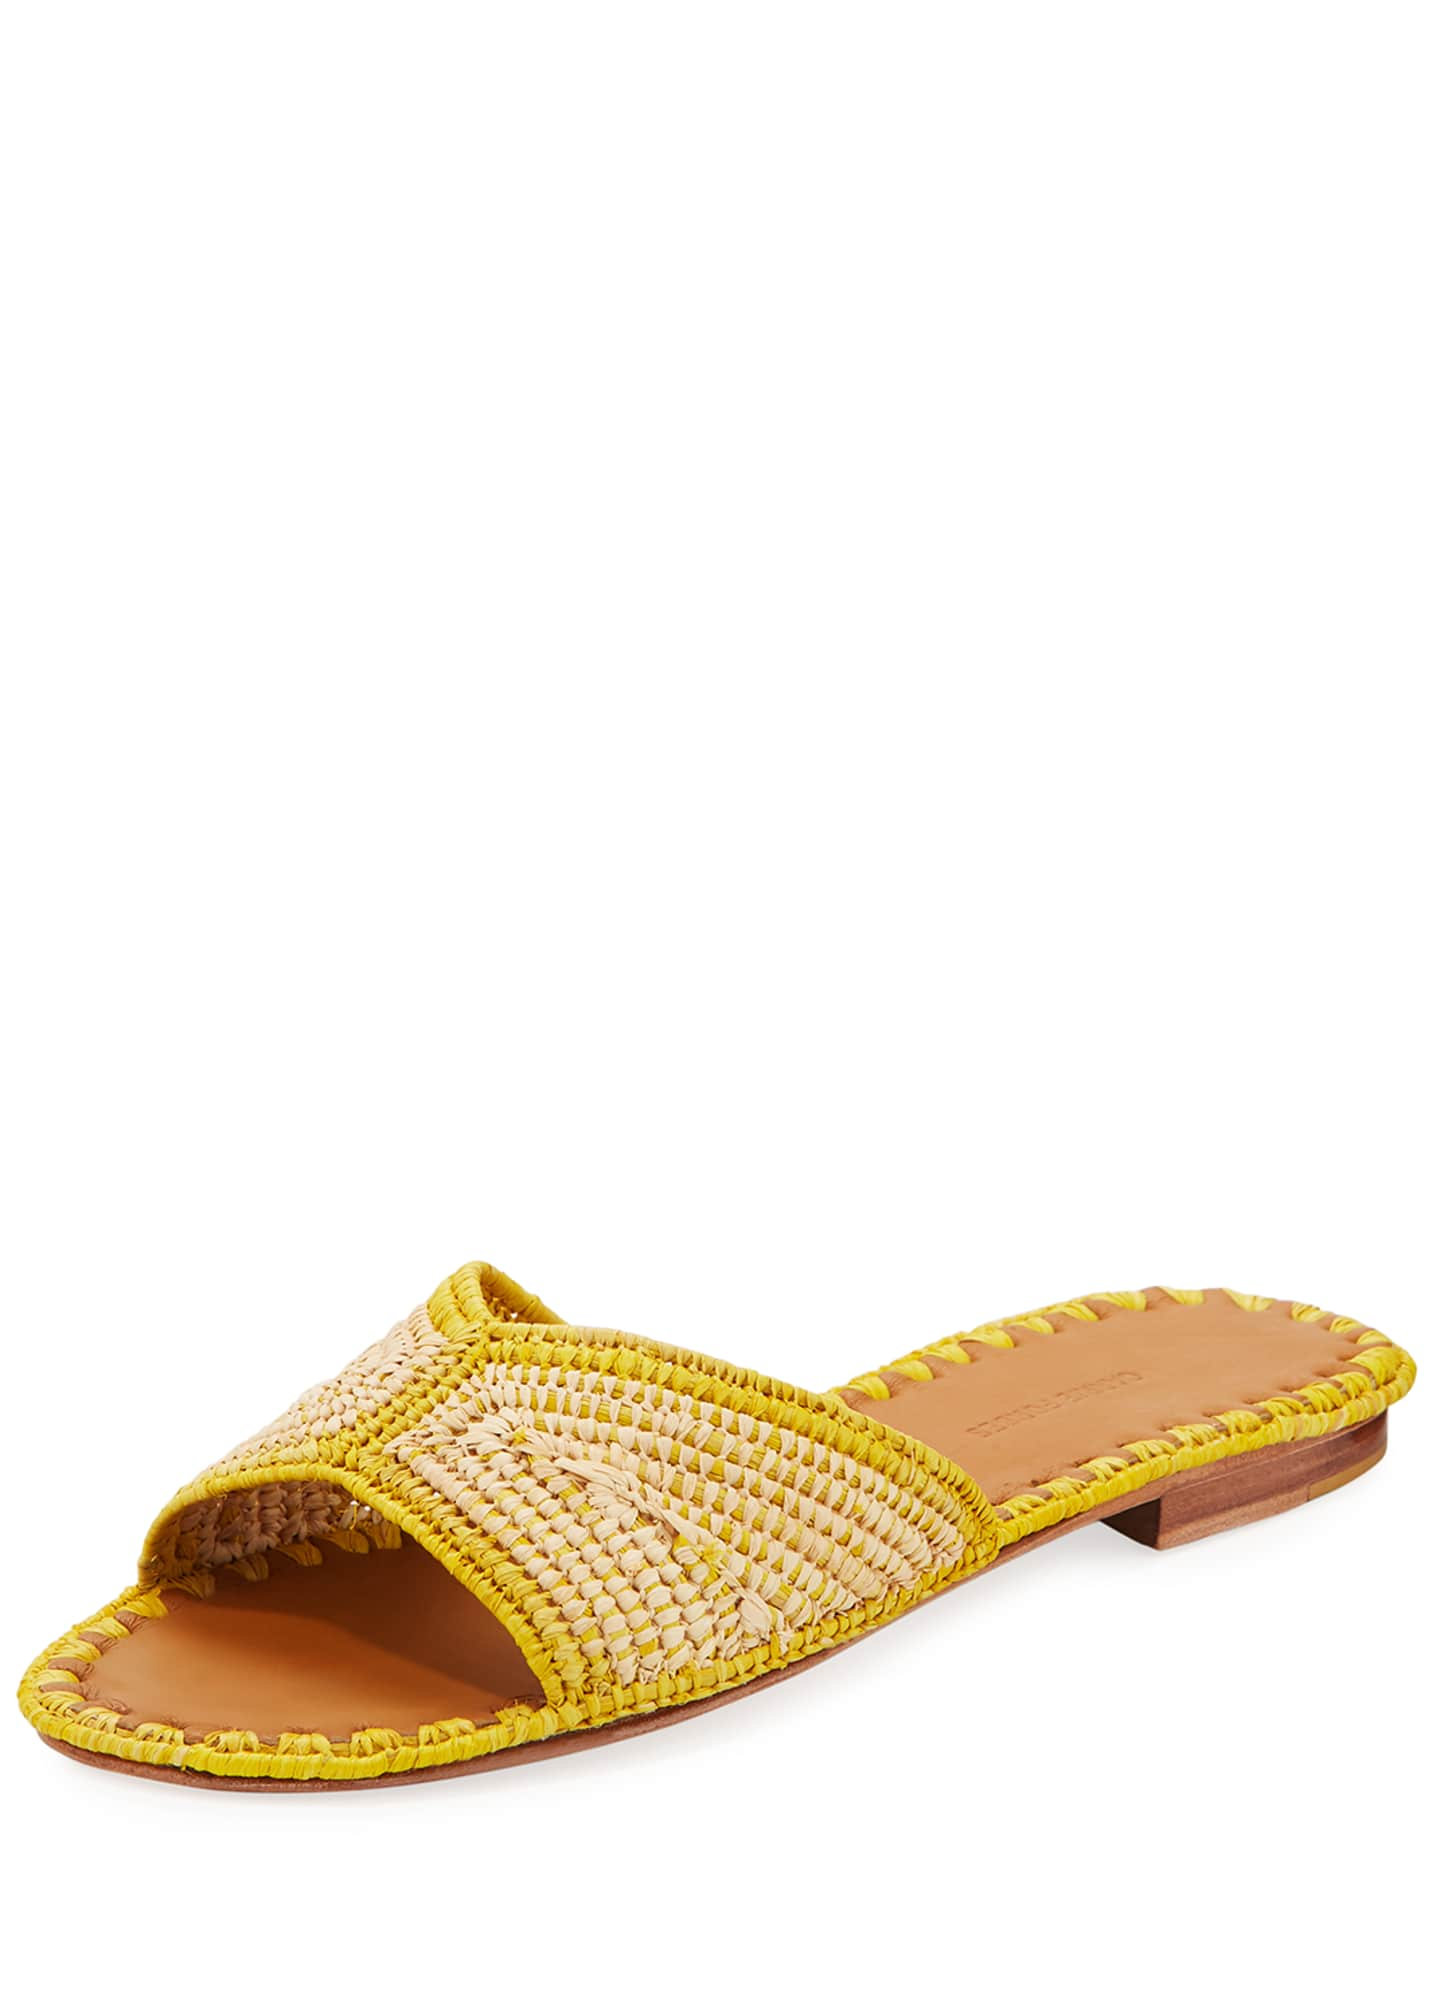 Carrie Forbes Salon Miste Woven Raffia Slide Sandals